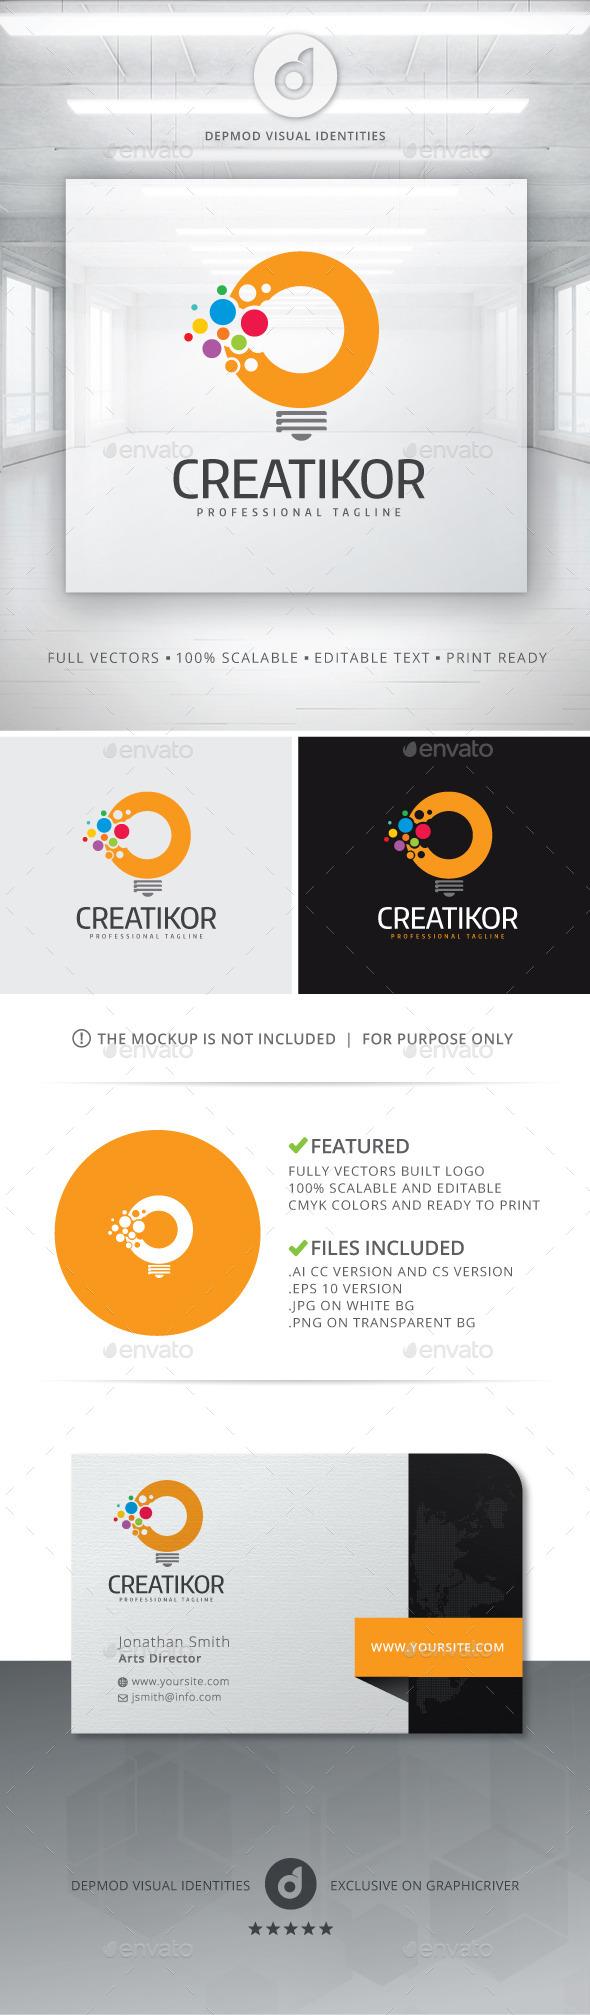 GraphicRiver Creatikor Logo 10968667